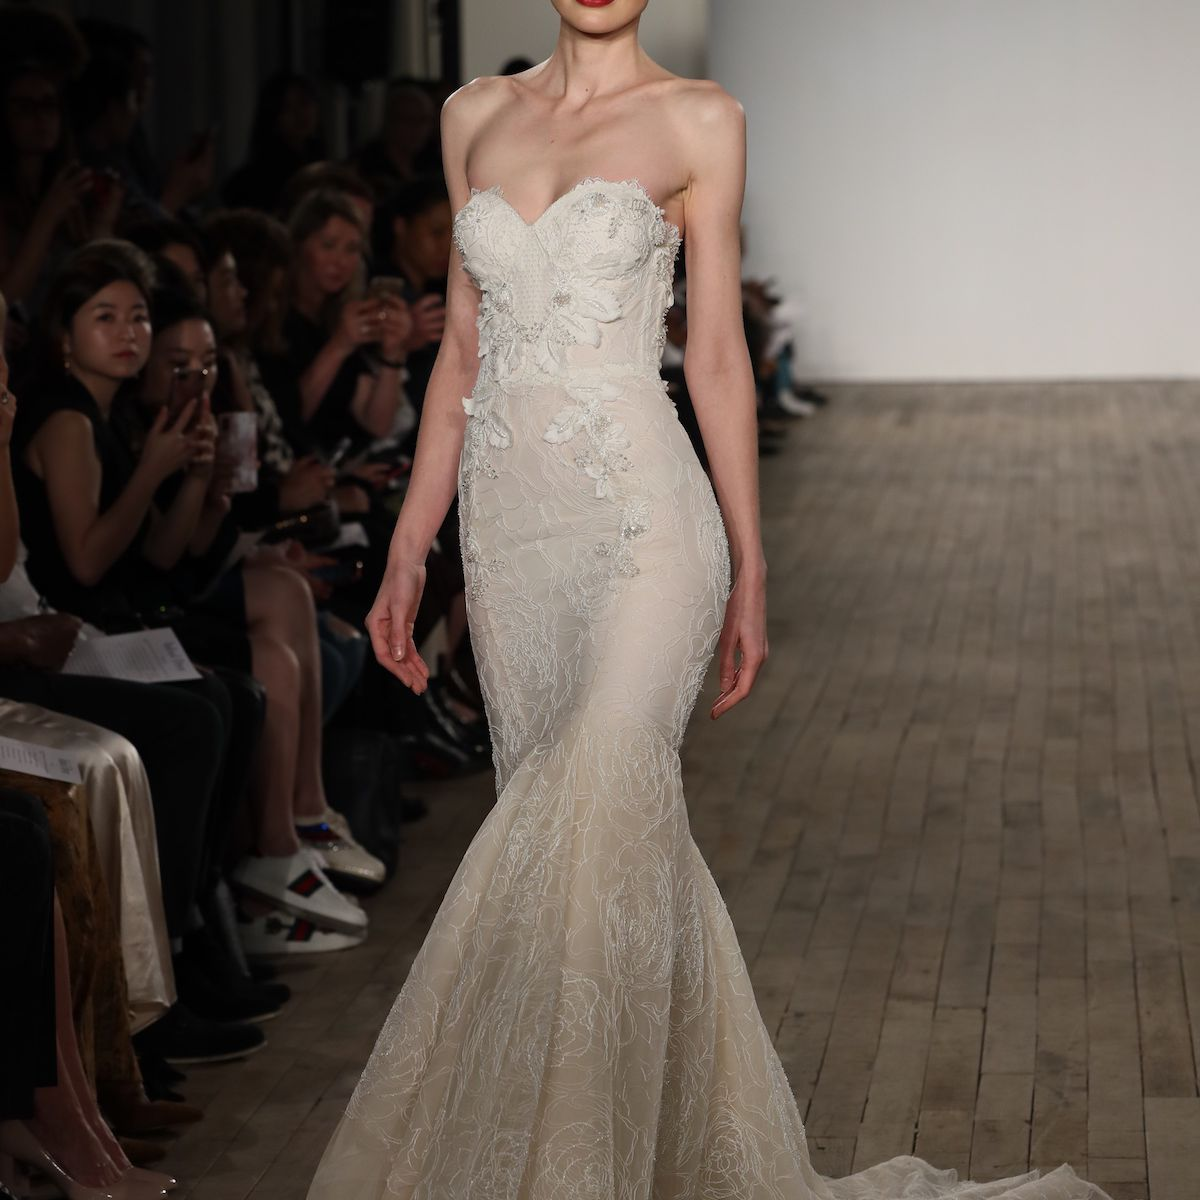 Model in embroidered Inbal Dror VIP wedding dress